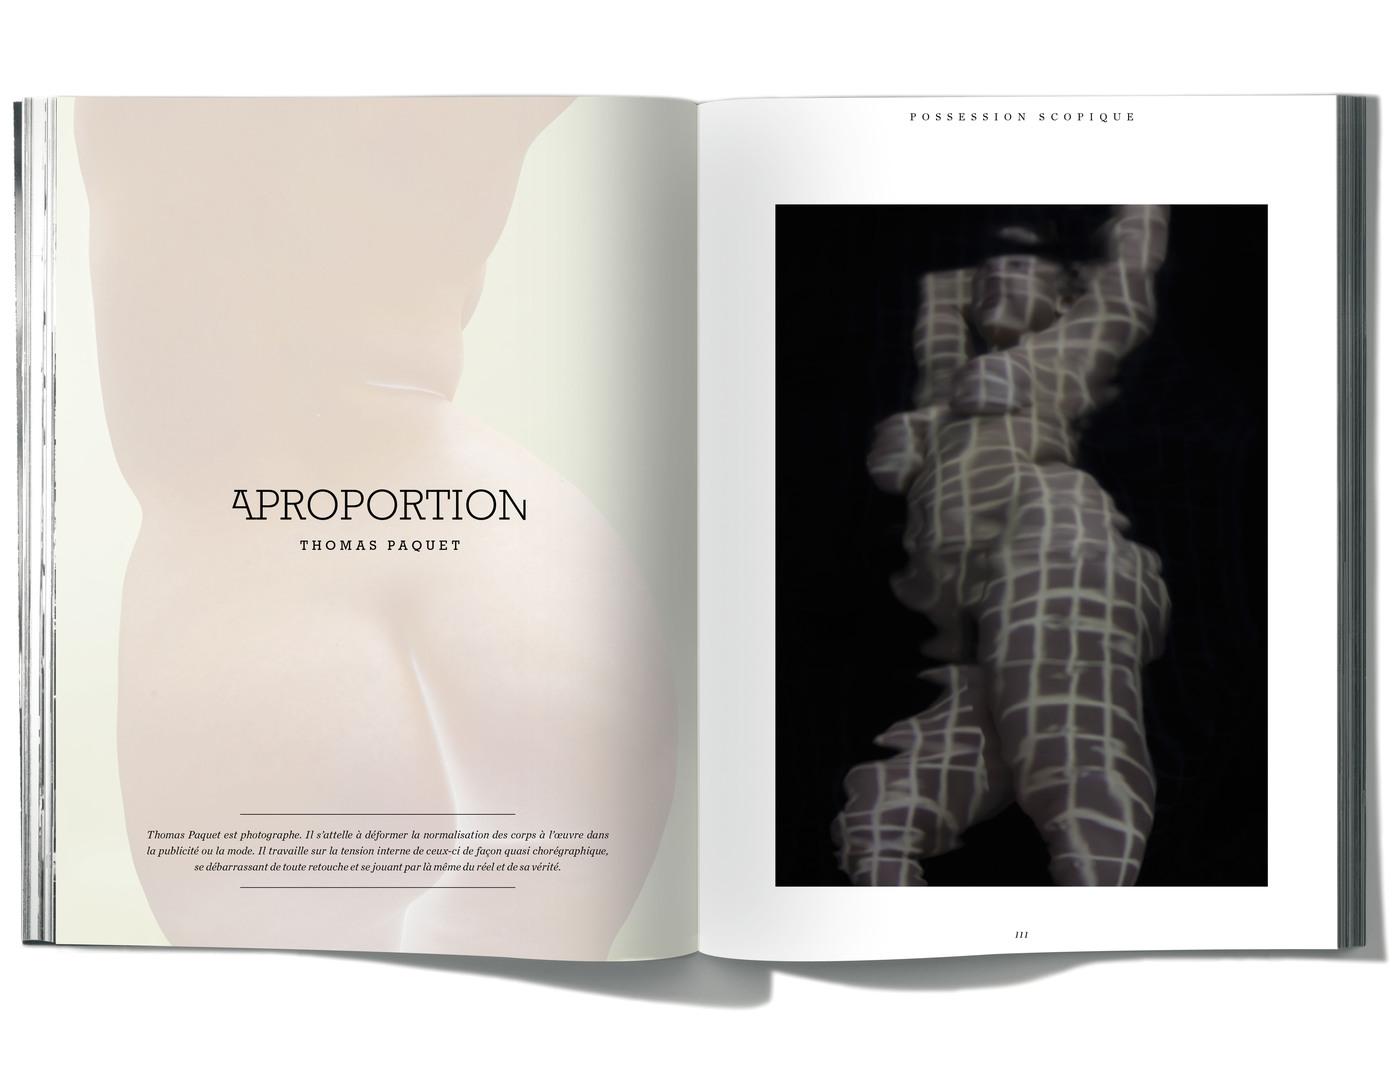 Photographies de Thomas Paquet, Aproportion